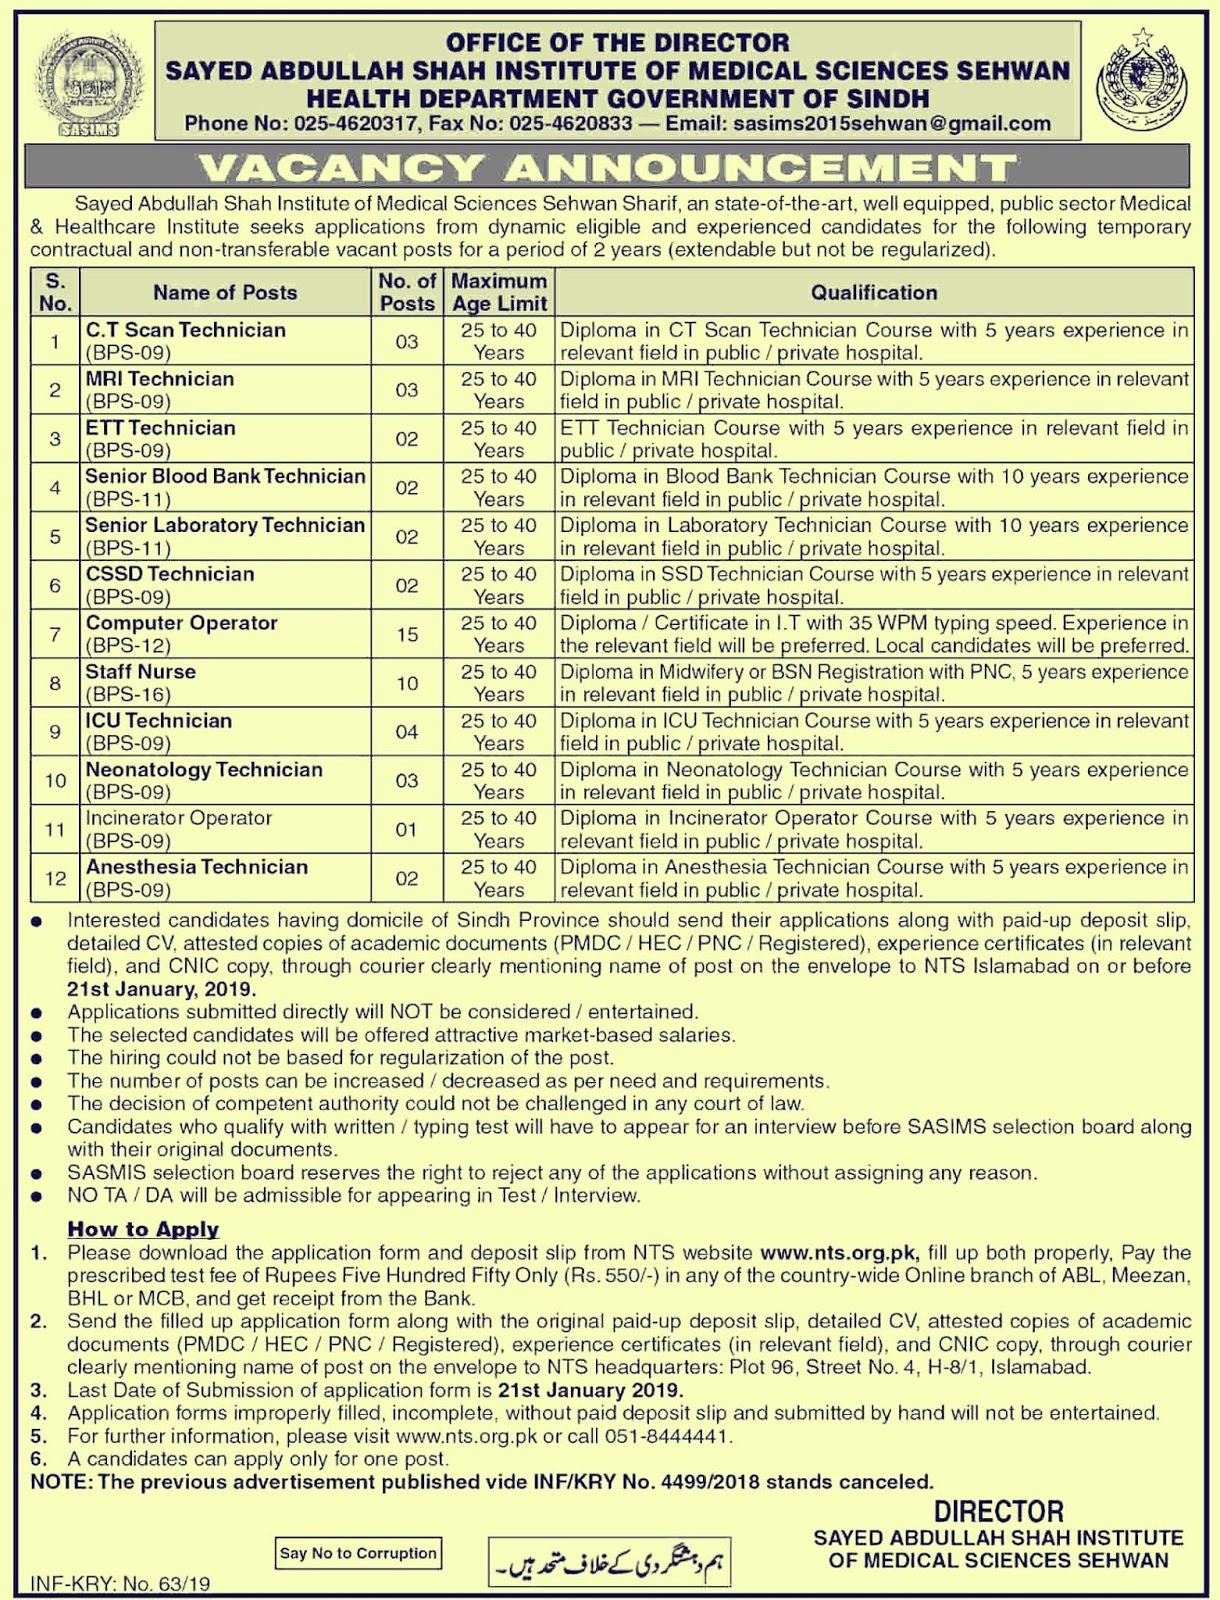 Sayed Abdullah Shah Institute Of Medical Sciences (SASIMS) Jobs 2019